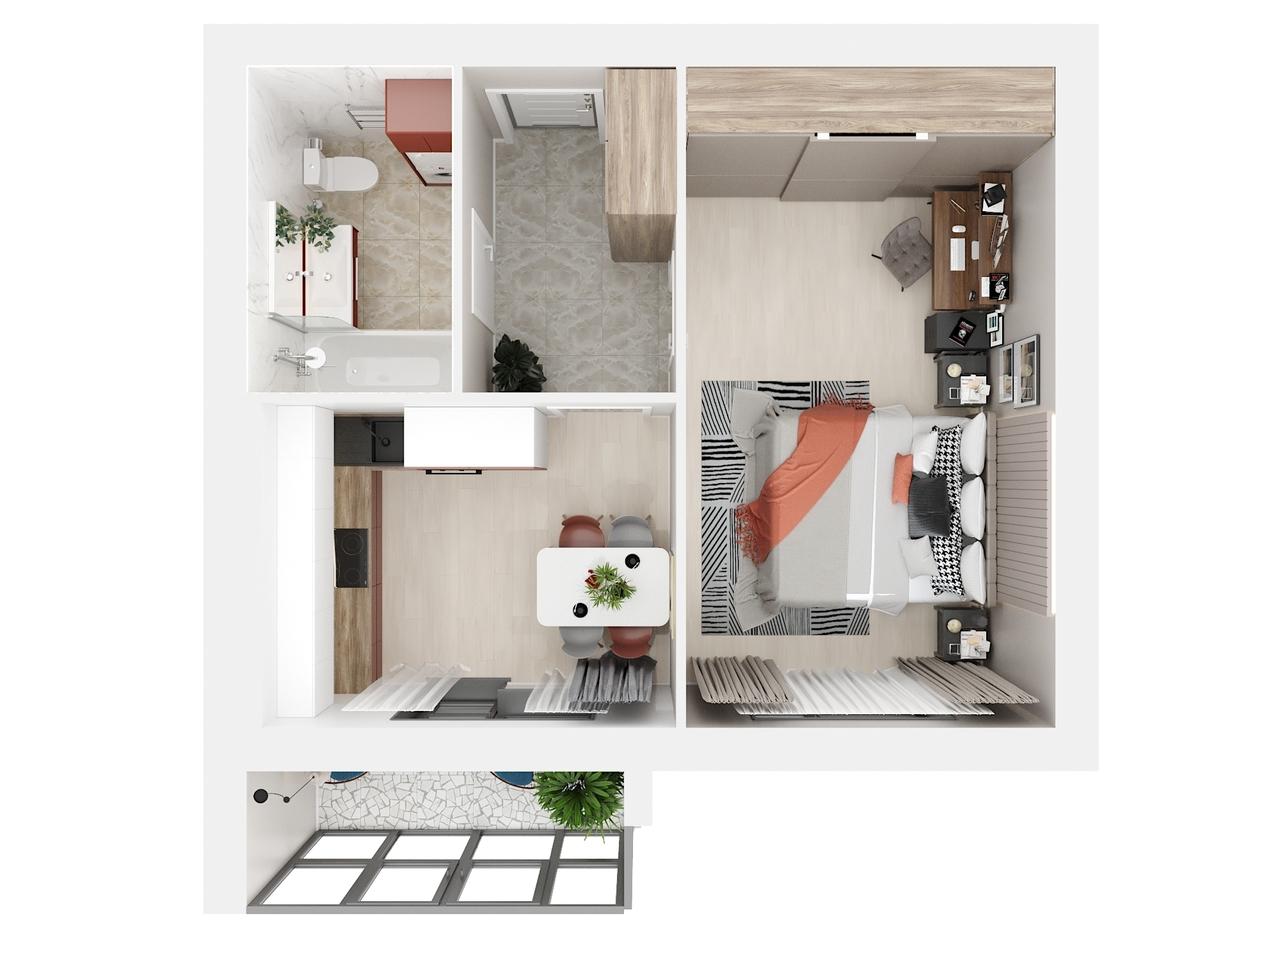 Дом 1 - 1-комнатная №25